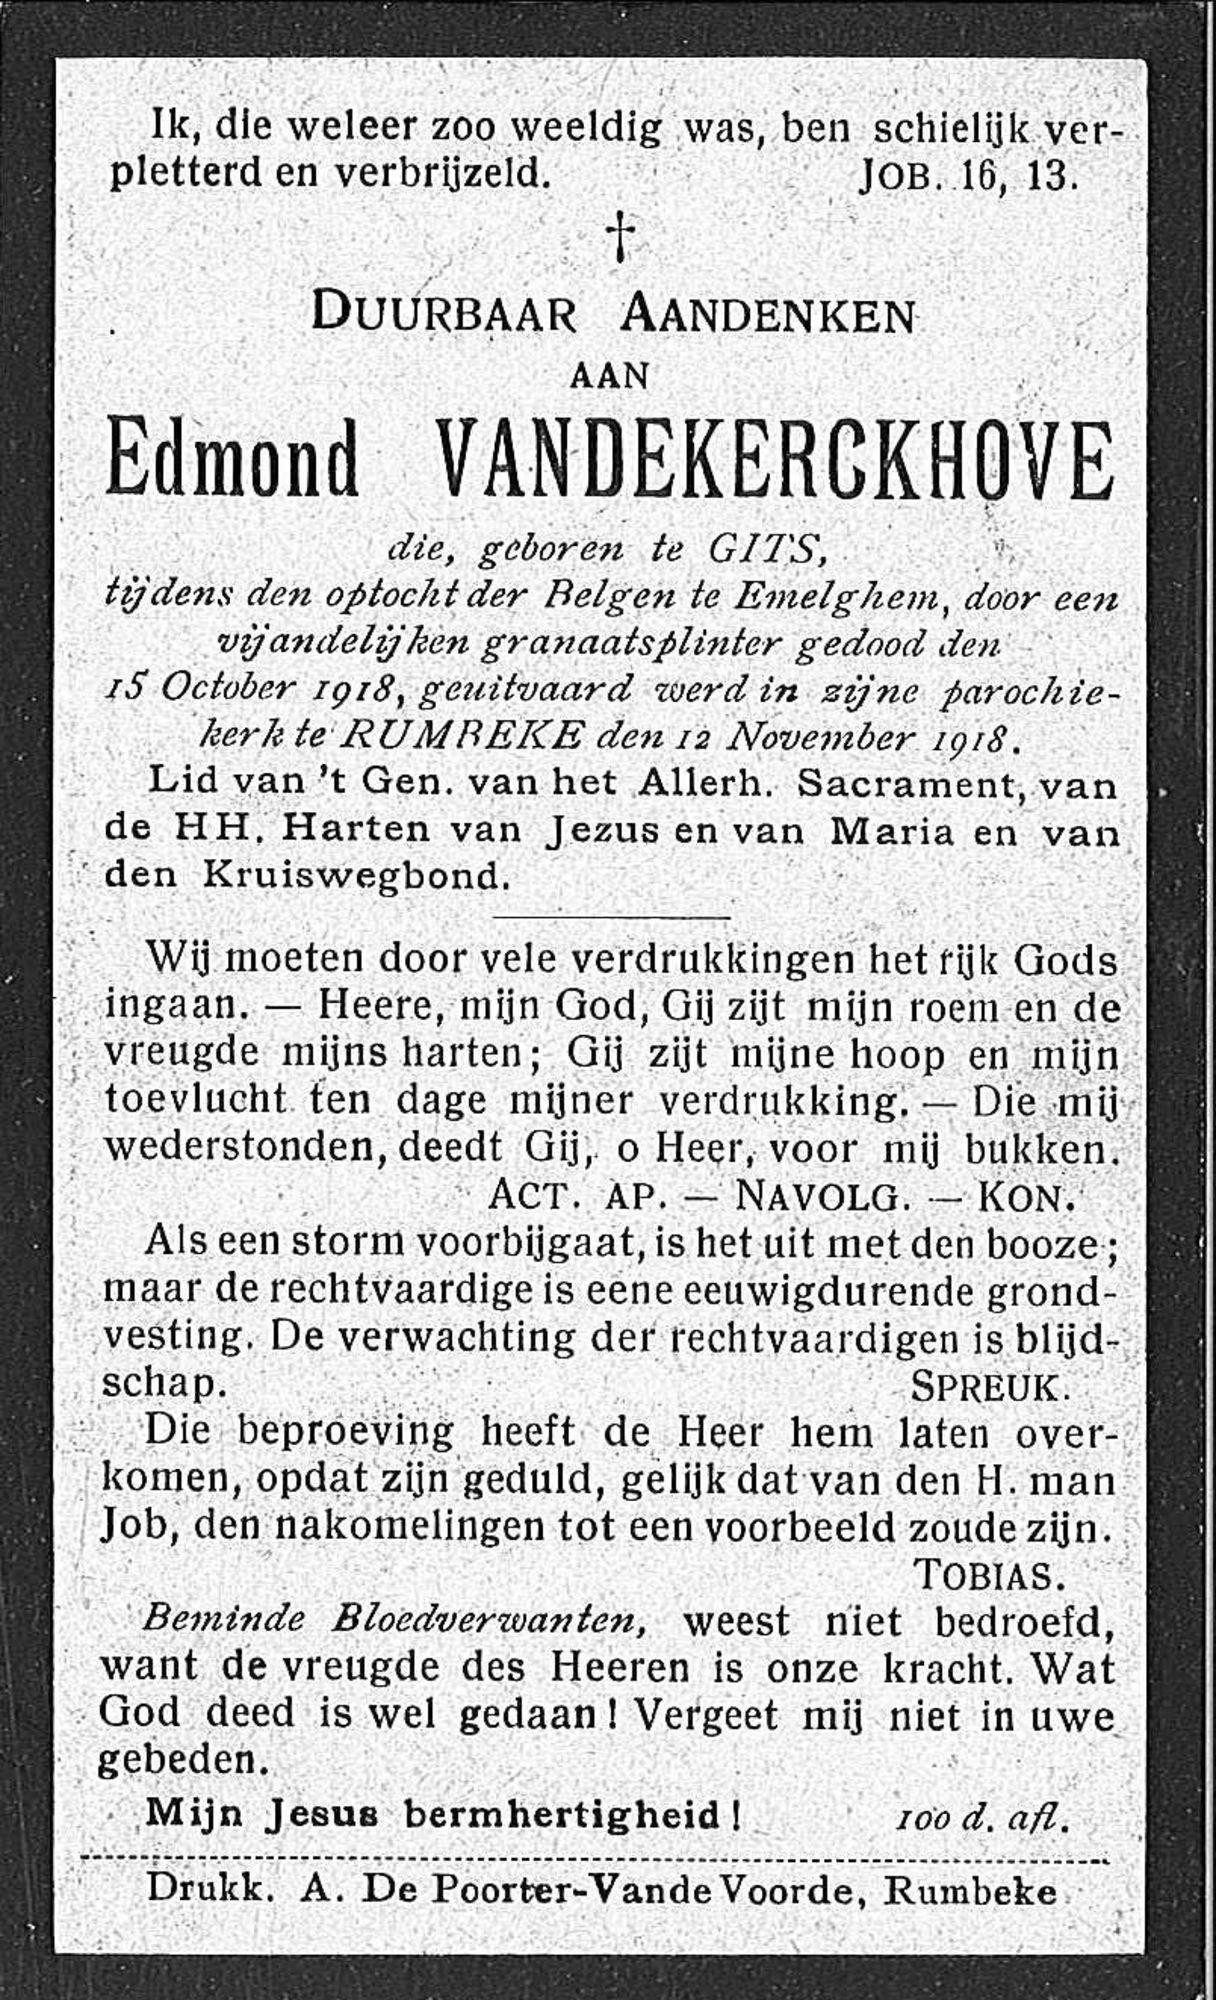 Edmond Vandekerkchove